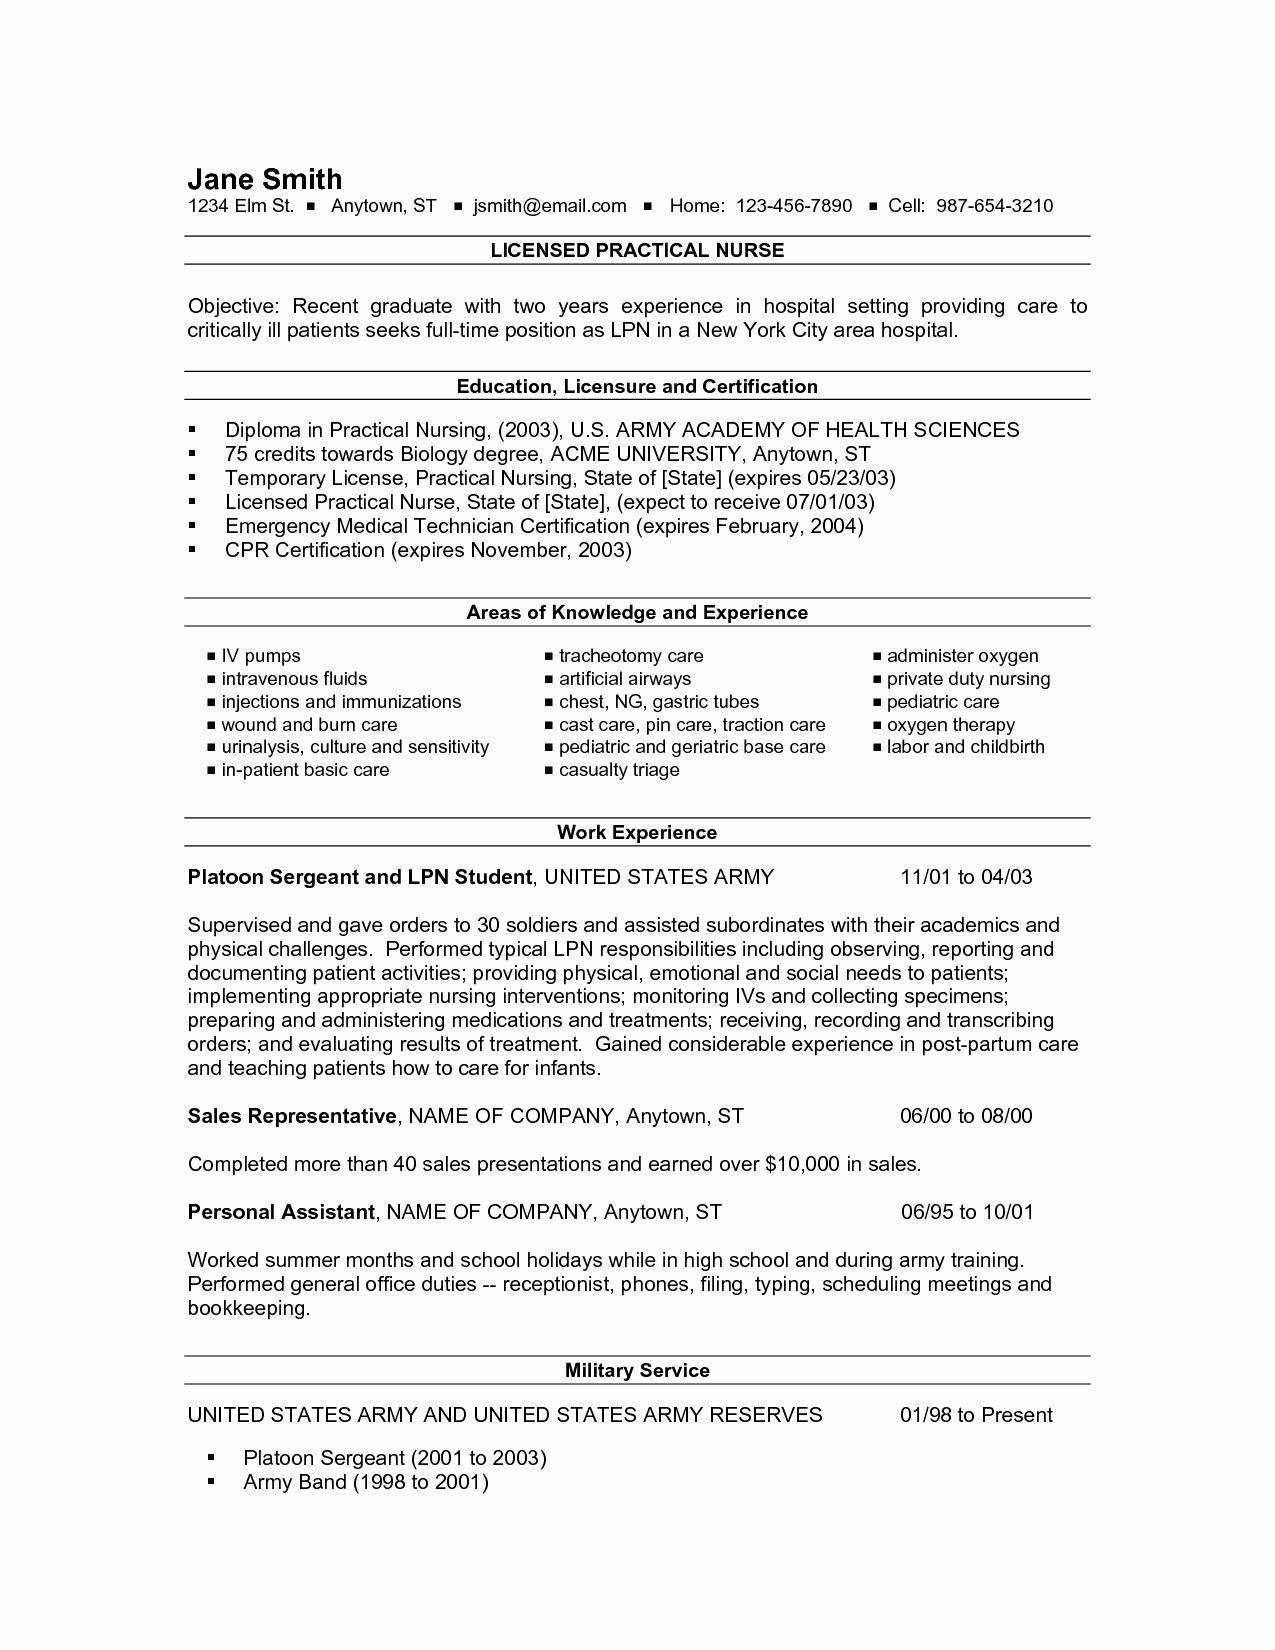 New Graduate Nurse Resume Examples Elegant New Grad Lpn Resume Resume Ideas Nursing Resume Template Nursing Resume Lpn Resume